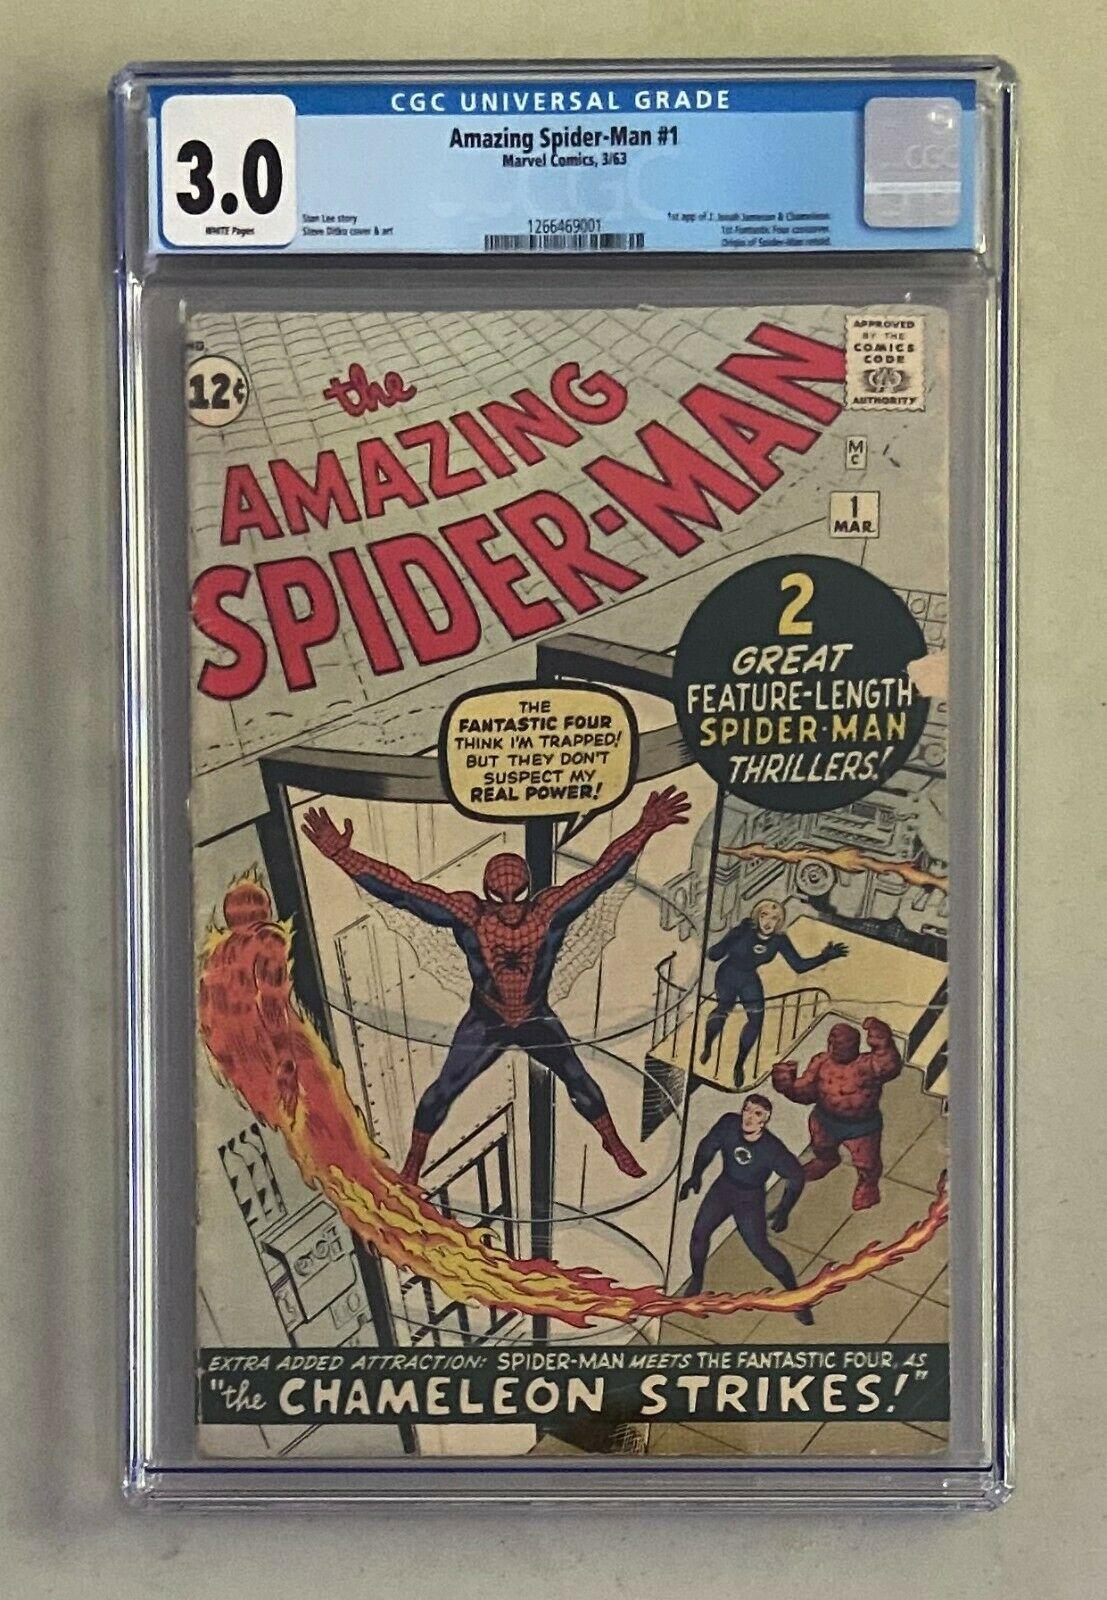 AMAZING SPIDERMAN 1 Marvel Comics 1963 CGC 30 Jonah Jameson 1st Appearance